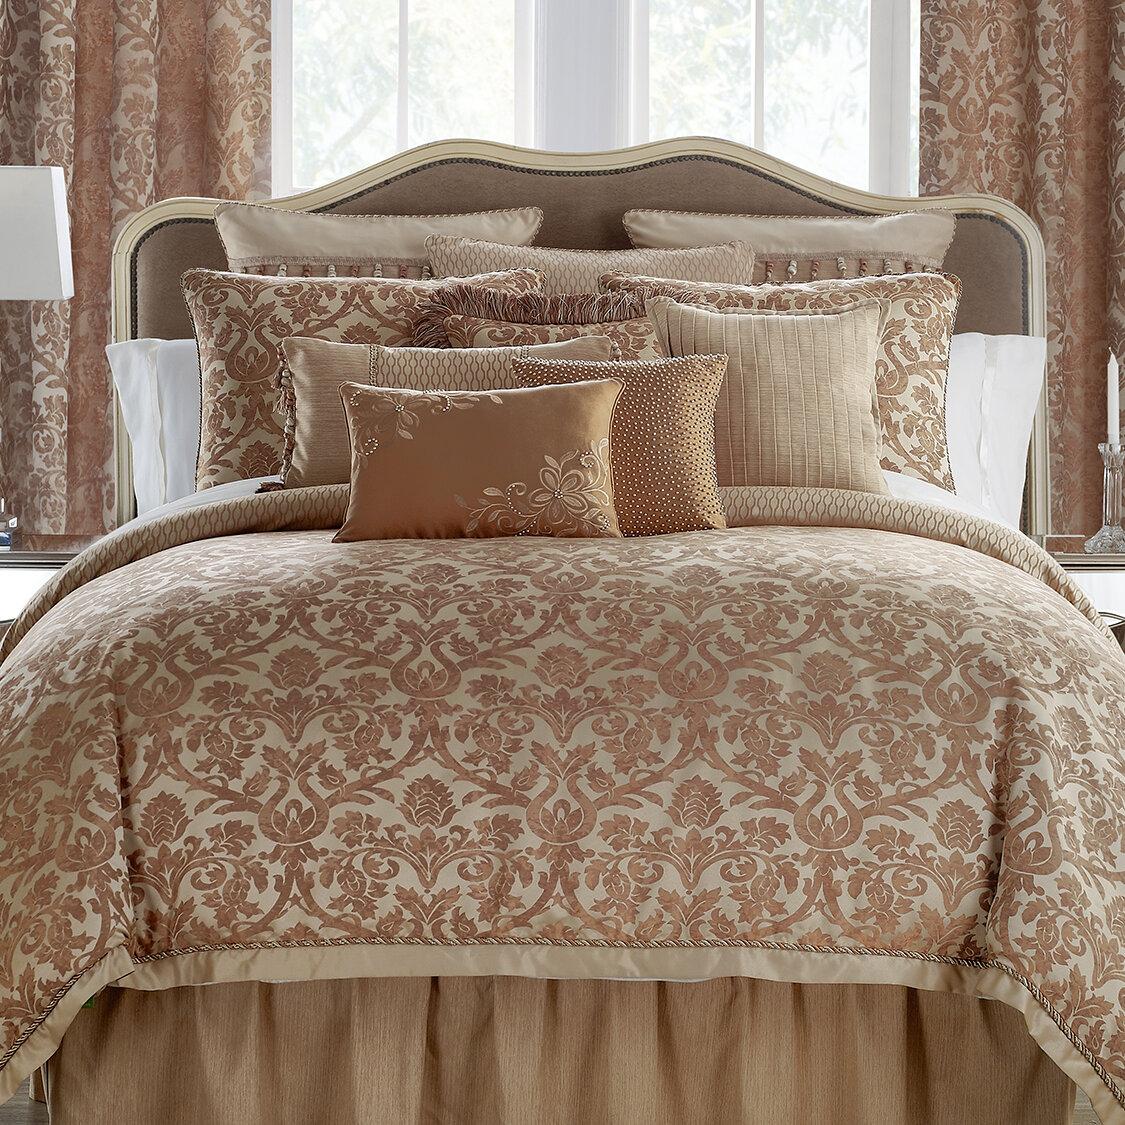 Waterford Bedding Margot 4 Piece Reversible Comforter Set | Wayfair